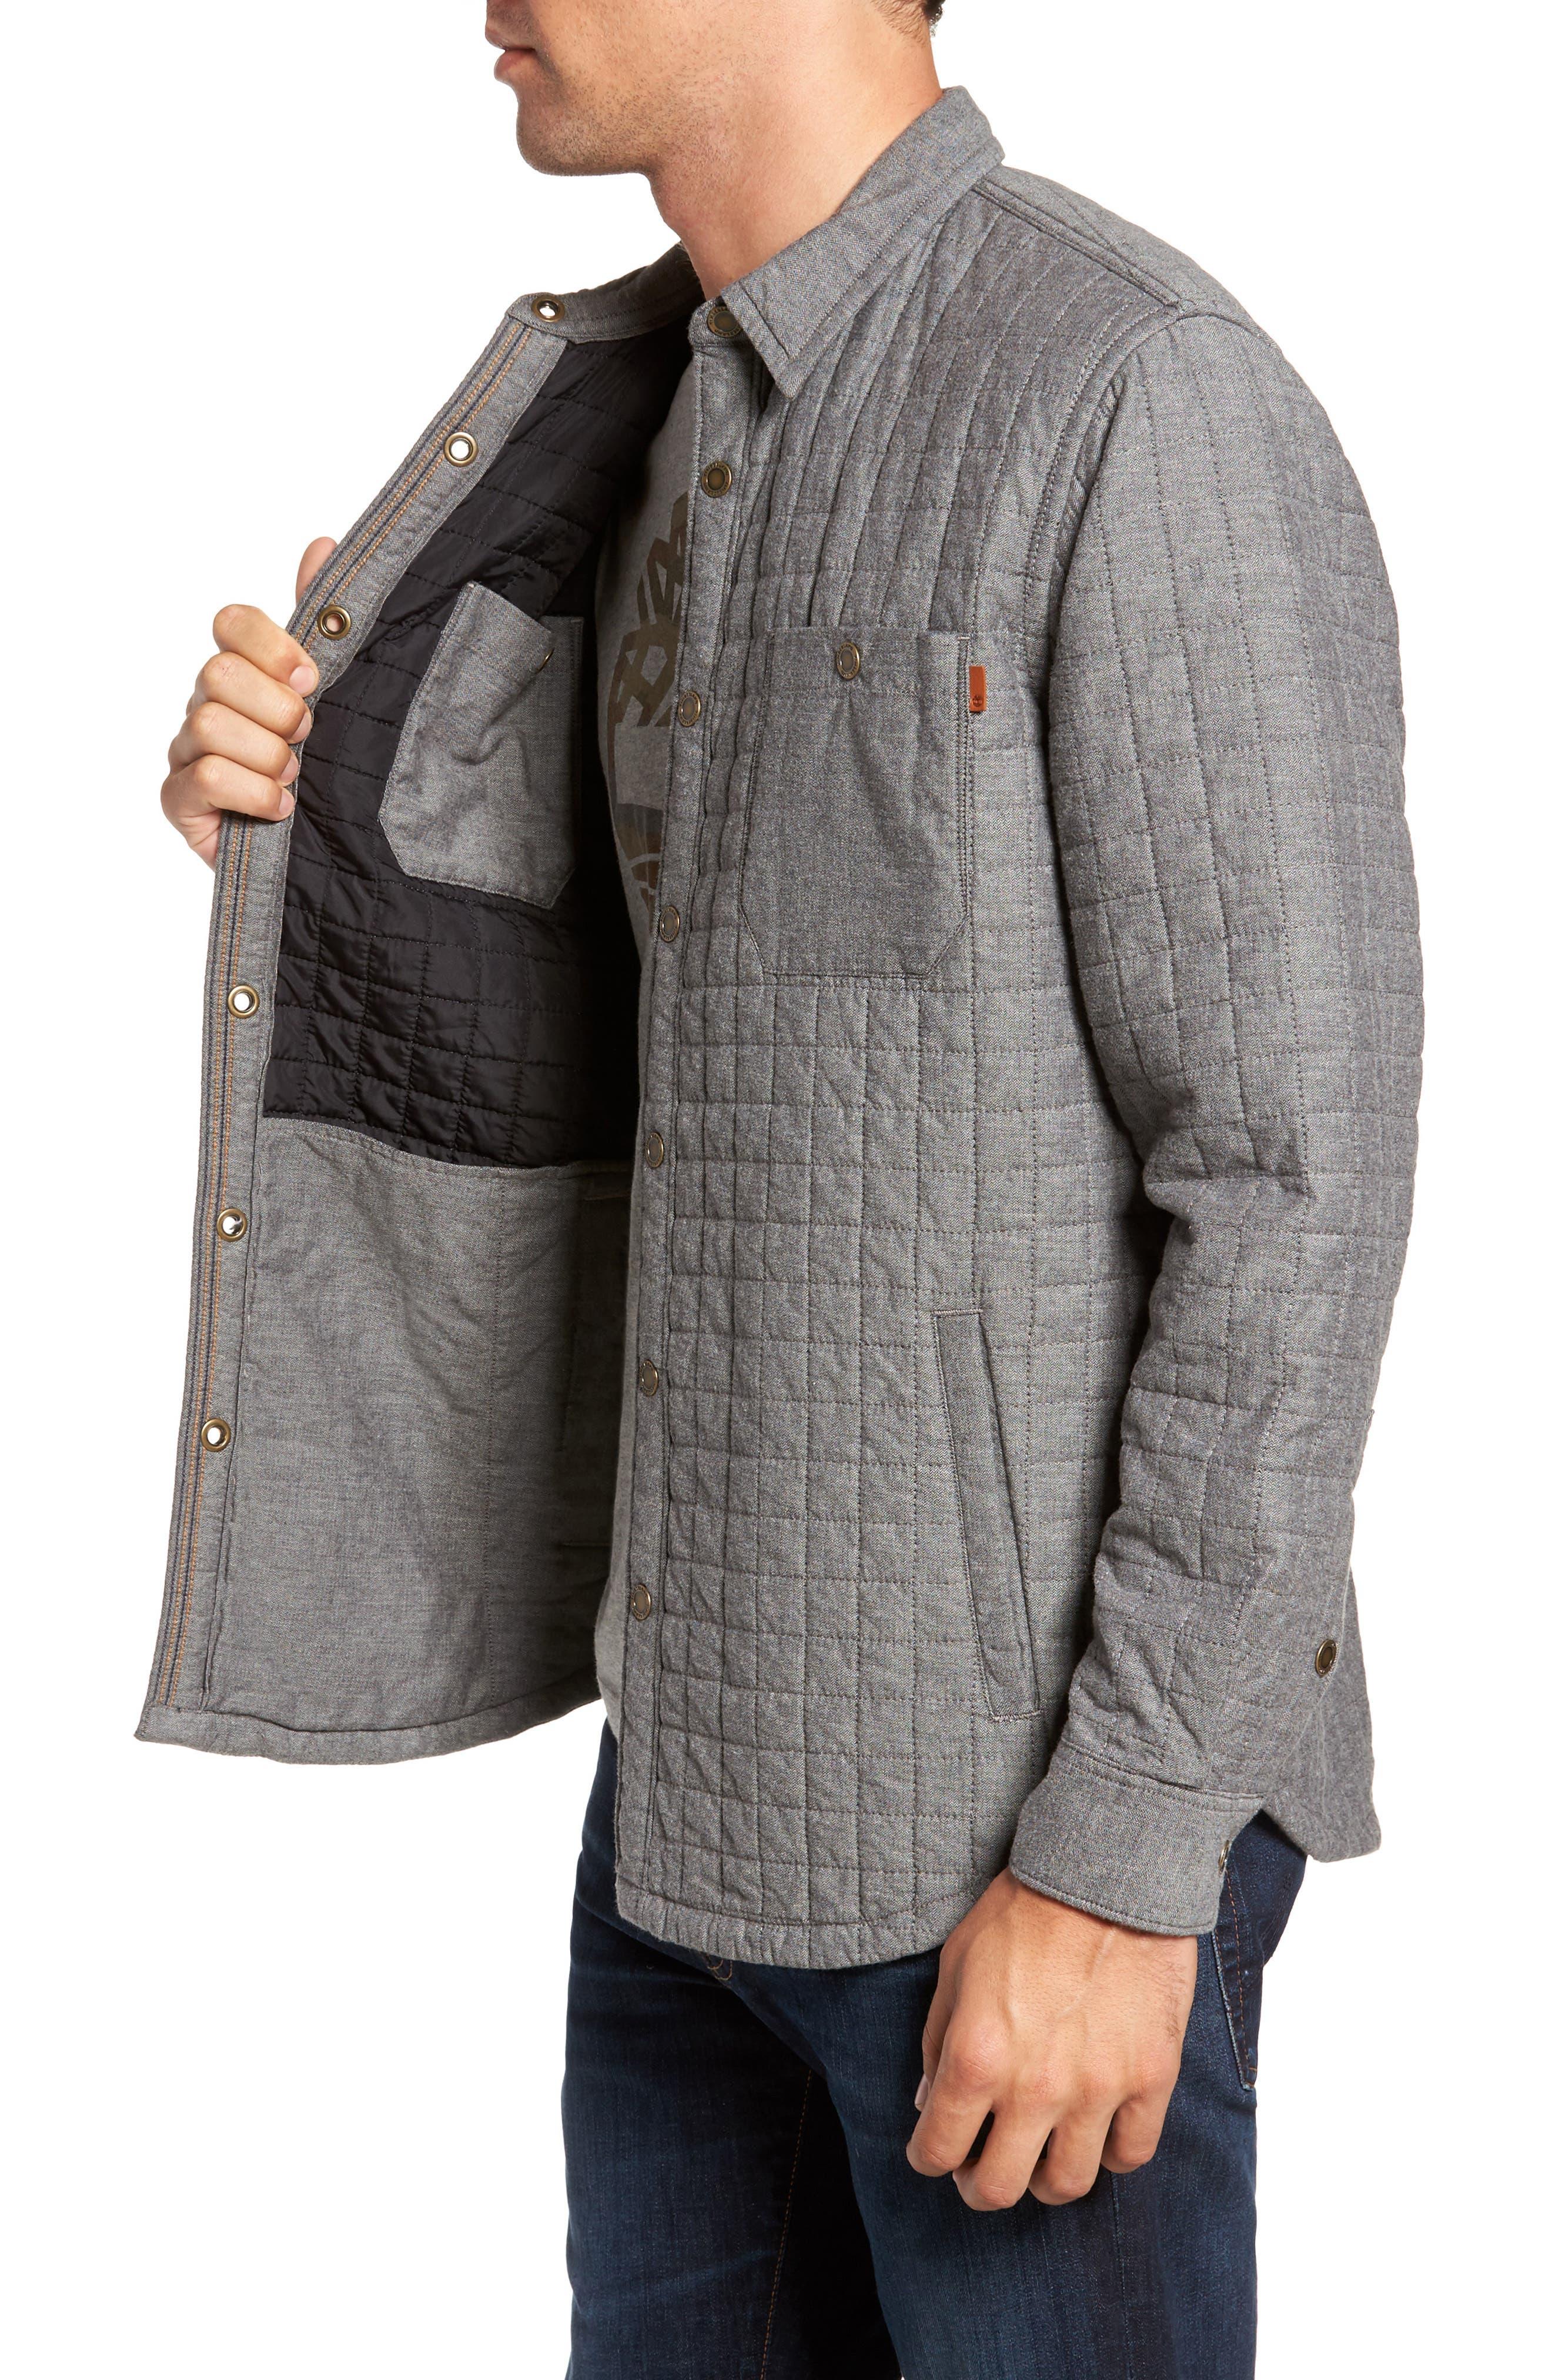 Gunstock River Lightweight Quilted Shirt Jacket,                             Alternate thumbnail 3, color,                             001